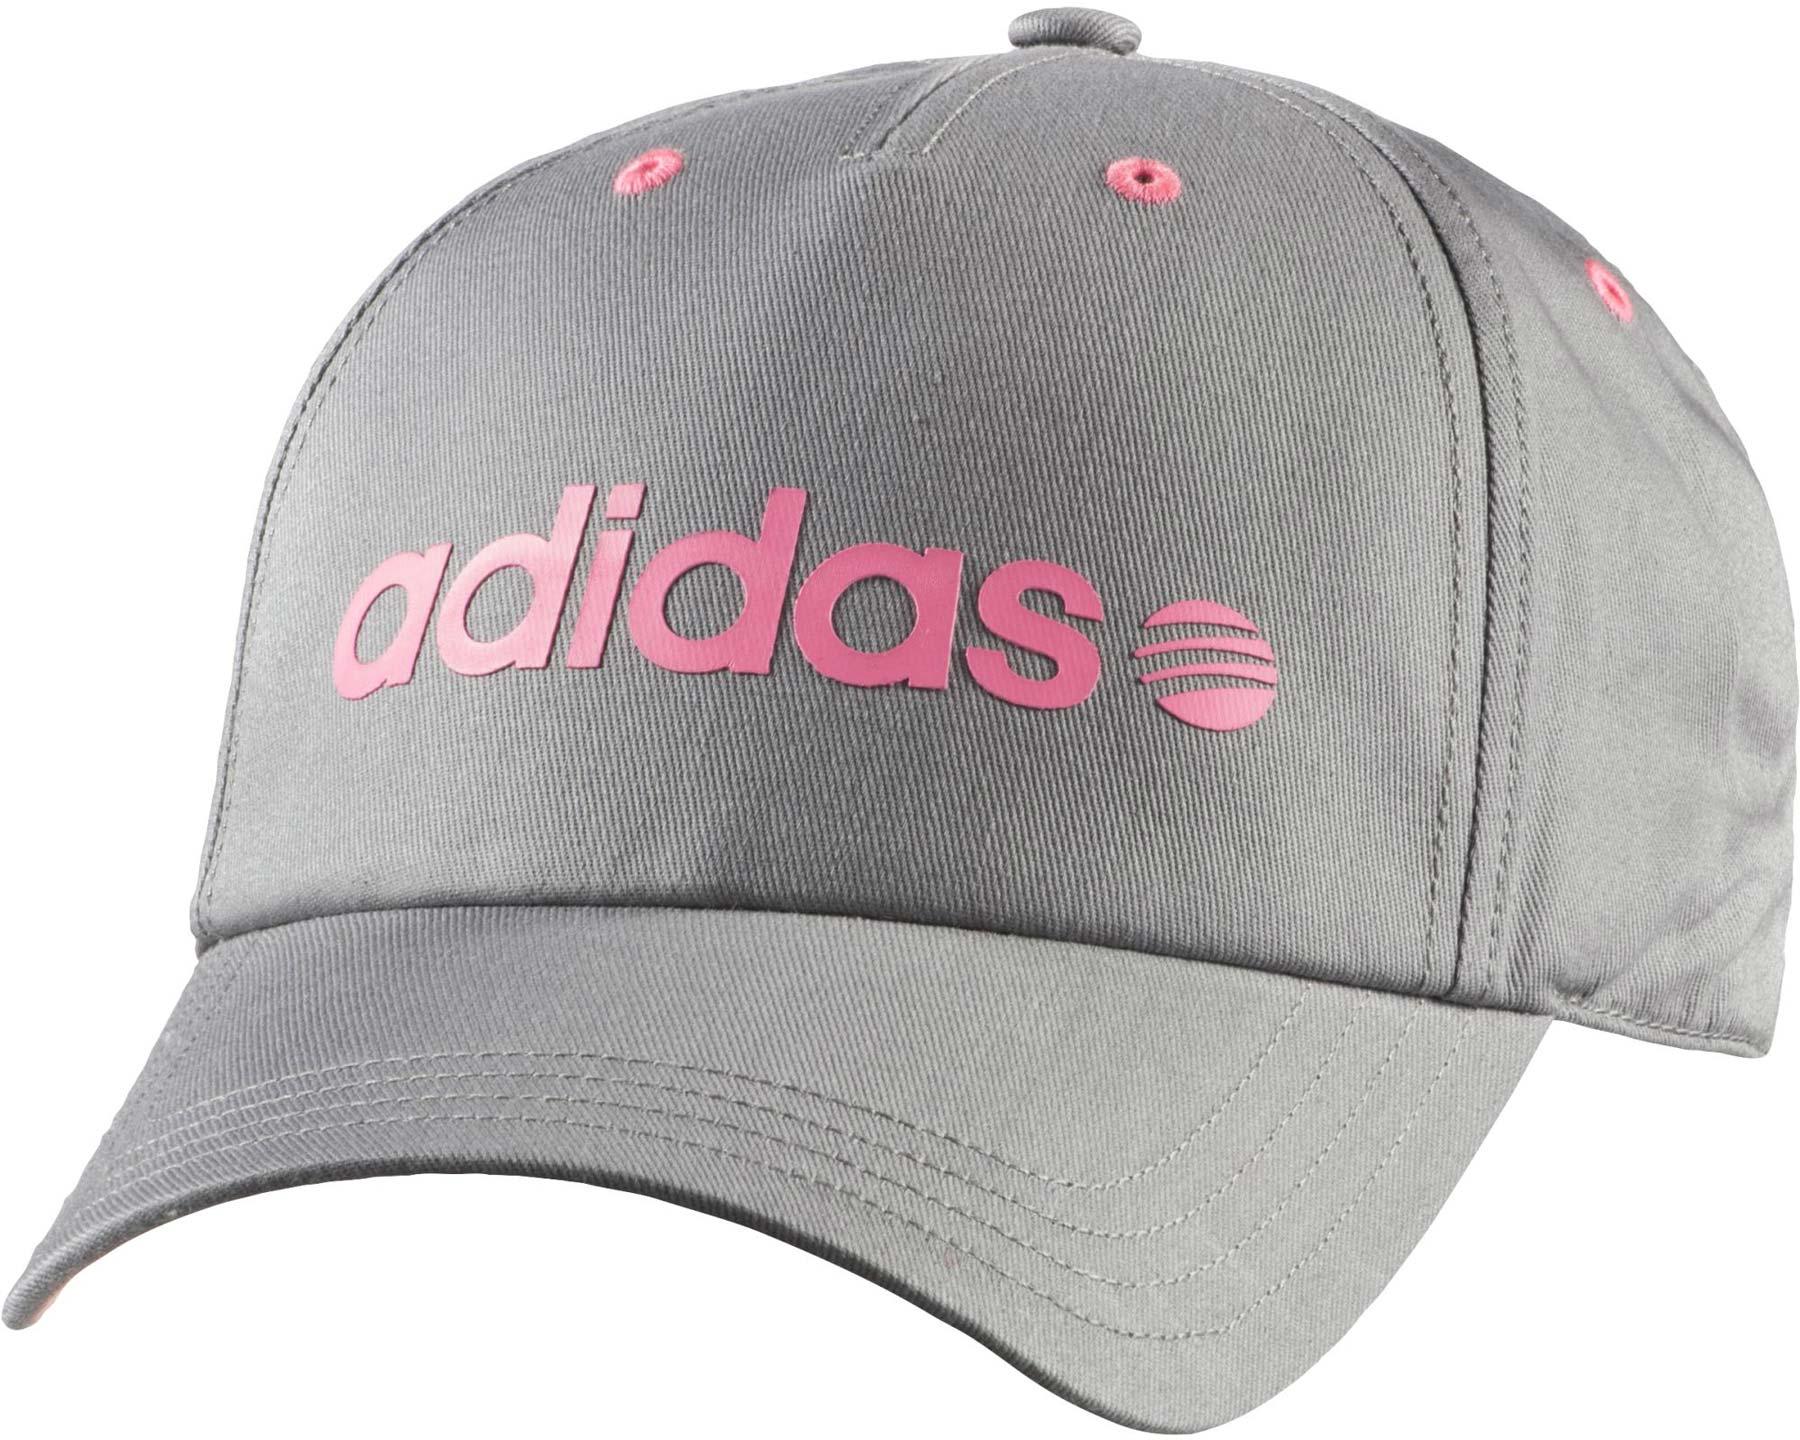 adidas neo caps